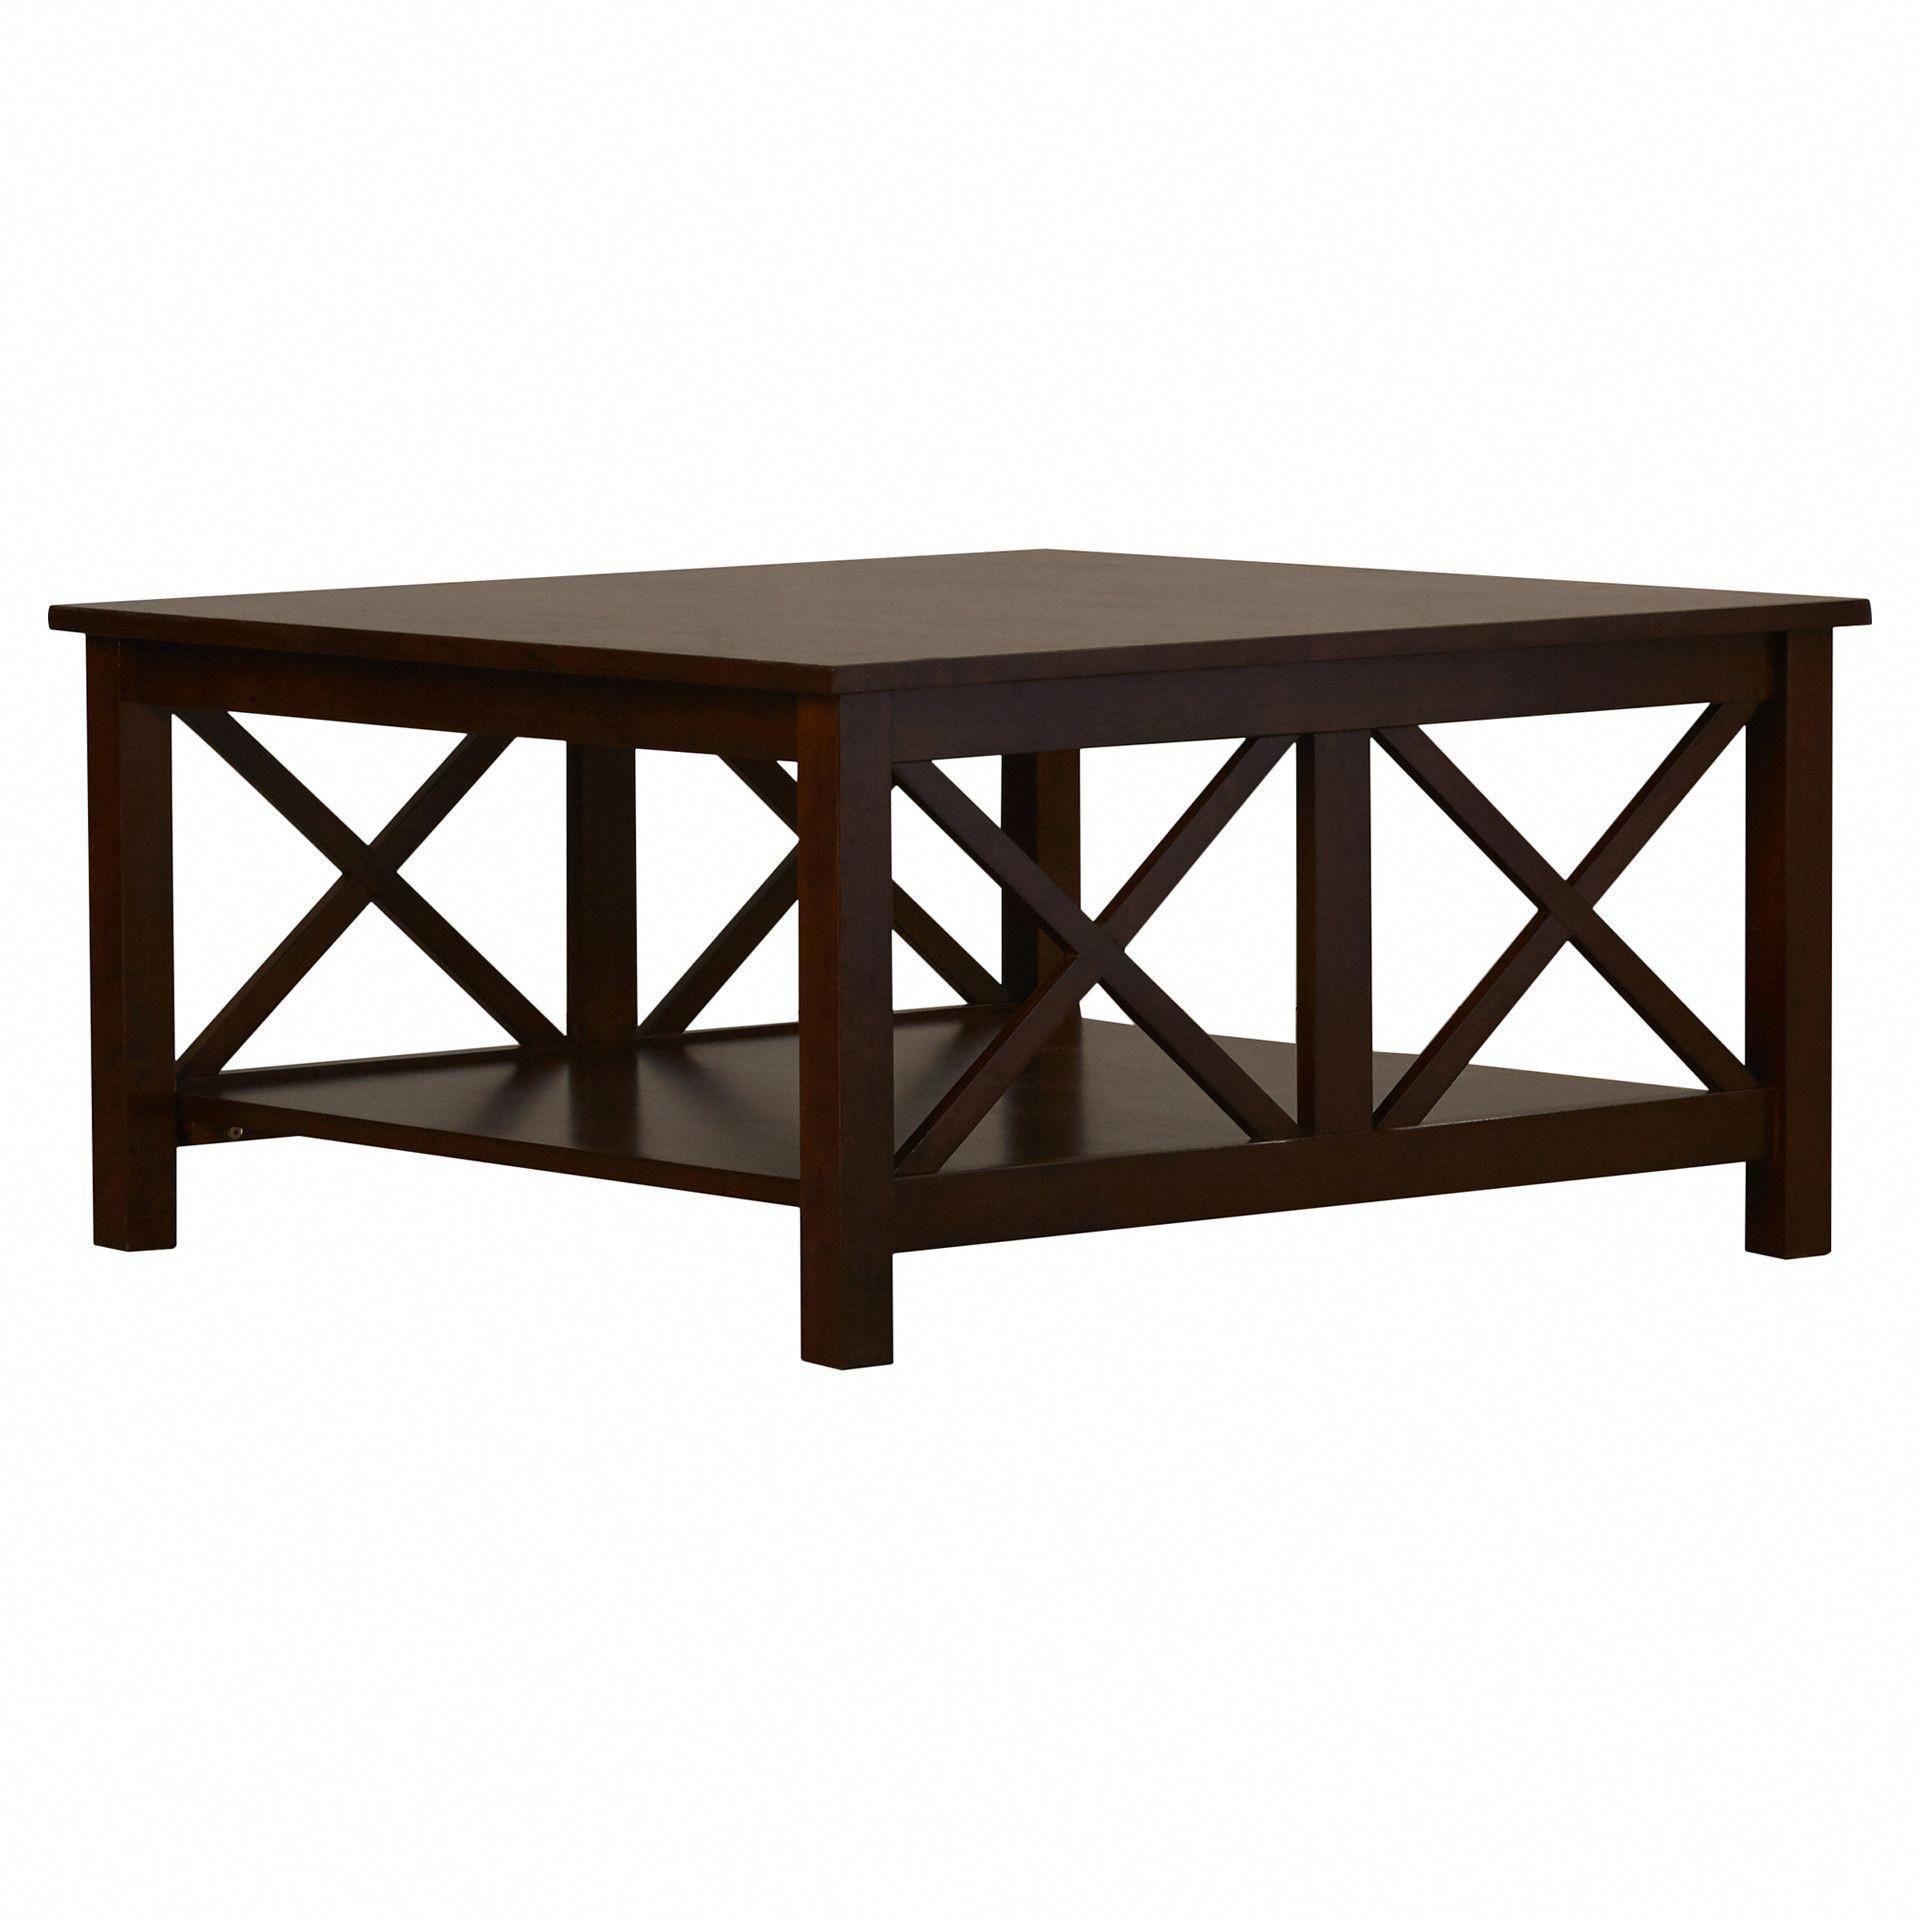 Royal Enfield Standard Royalenfield Coffee Table With Storage Coffee Table Wood Coffee Table [ 1920 x 1920 Pixel ]